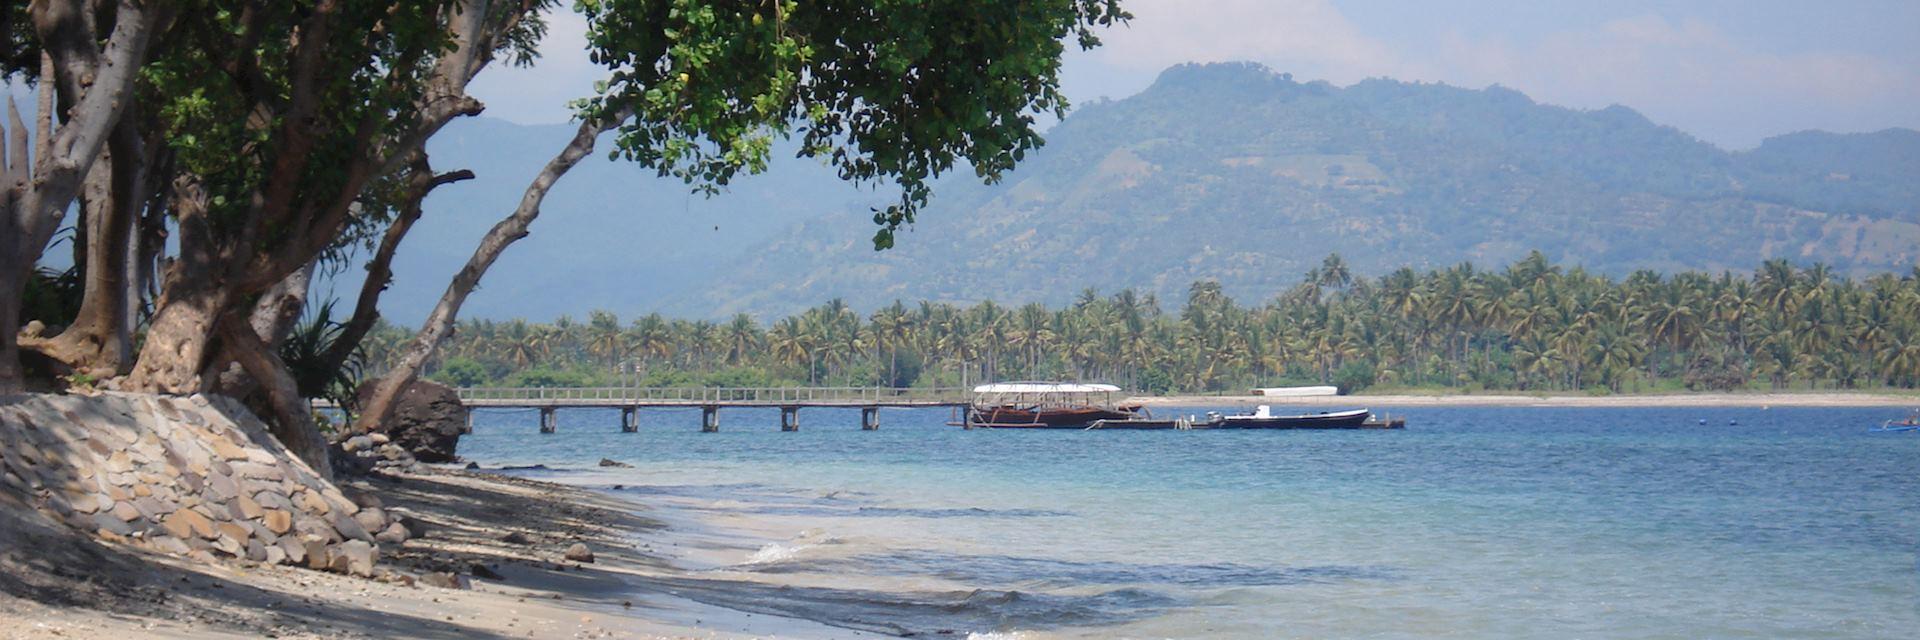 Medana Bay